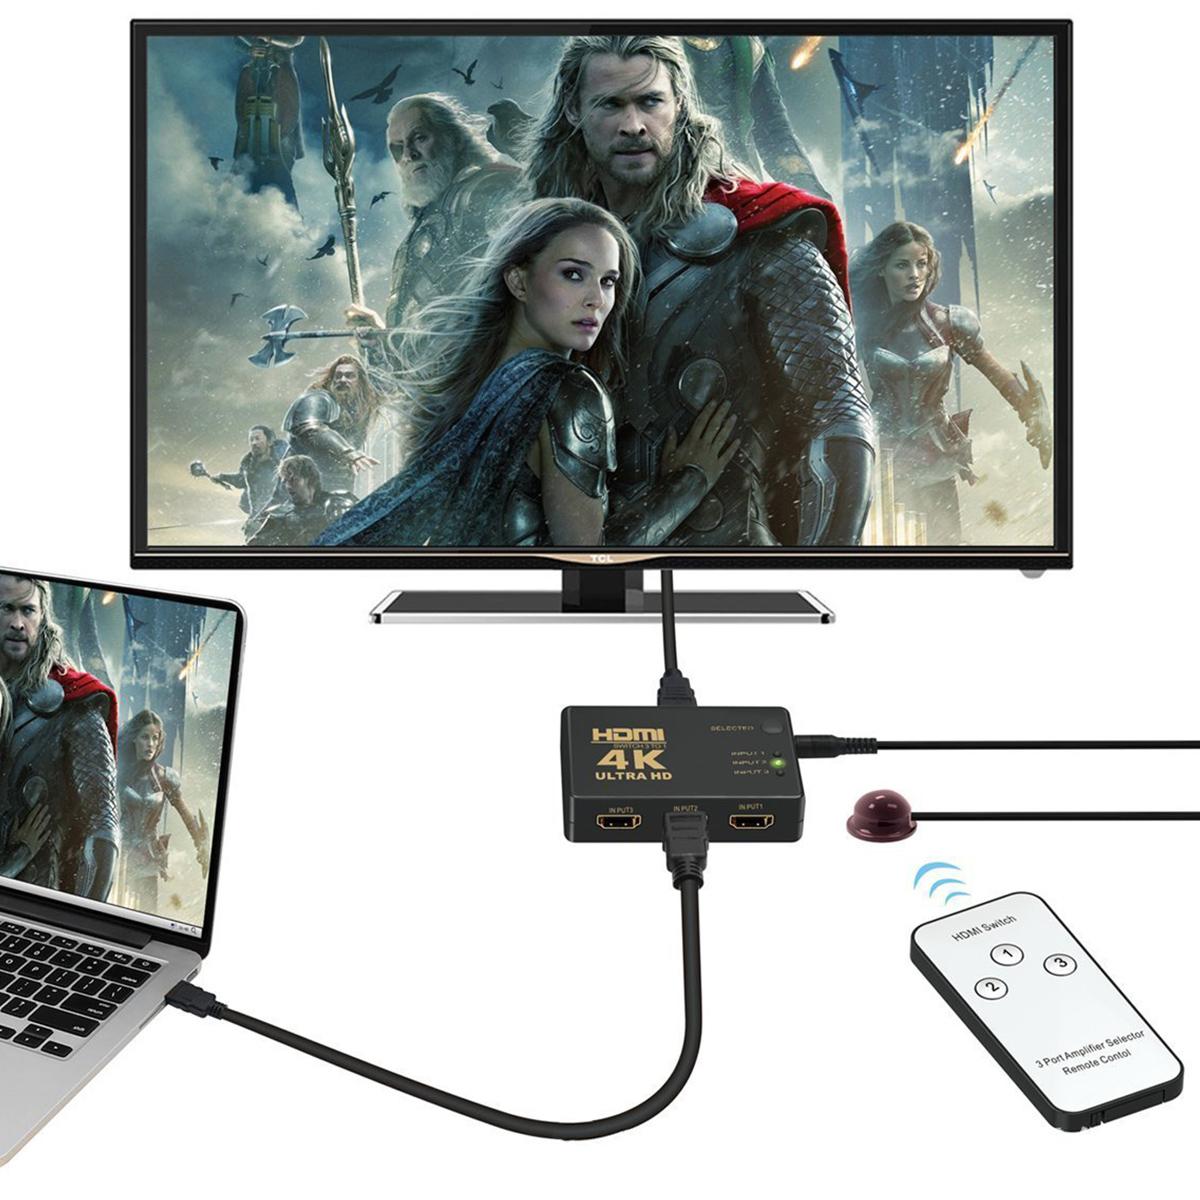 HDMI切替器 3入力1出力 HDMI セレクター 4K 2K FHD対応 自動切り替え 3D映像対応 USB給電